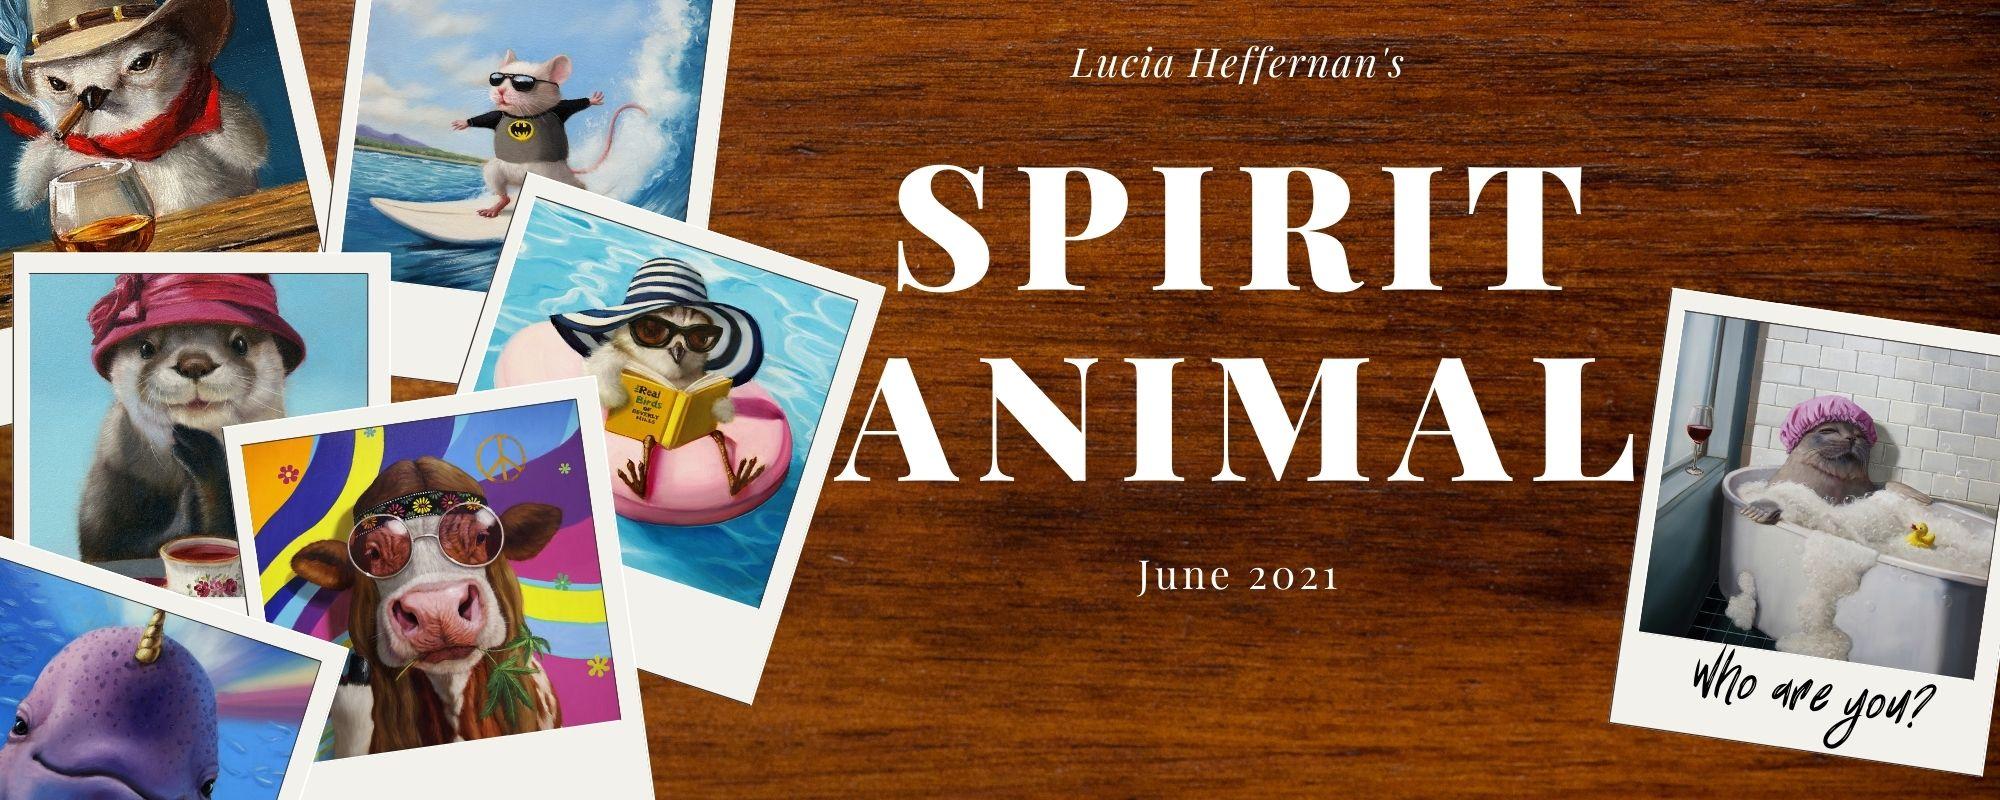 spirit animal banner